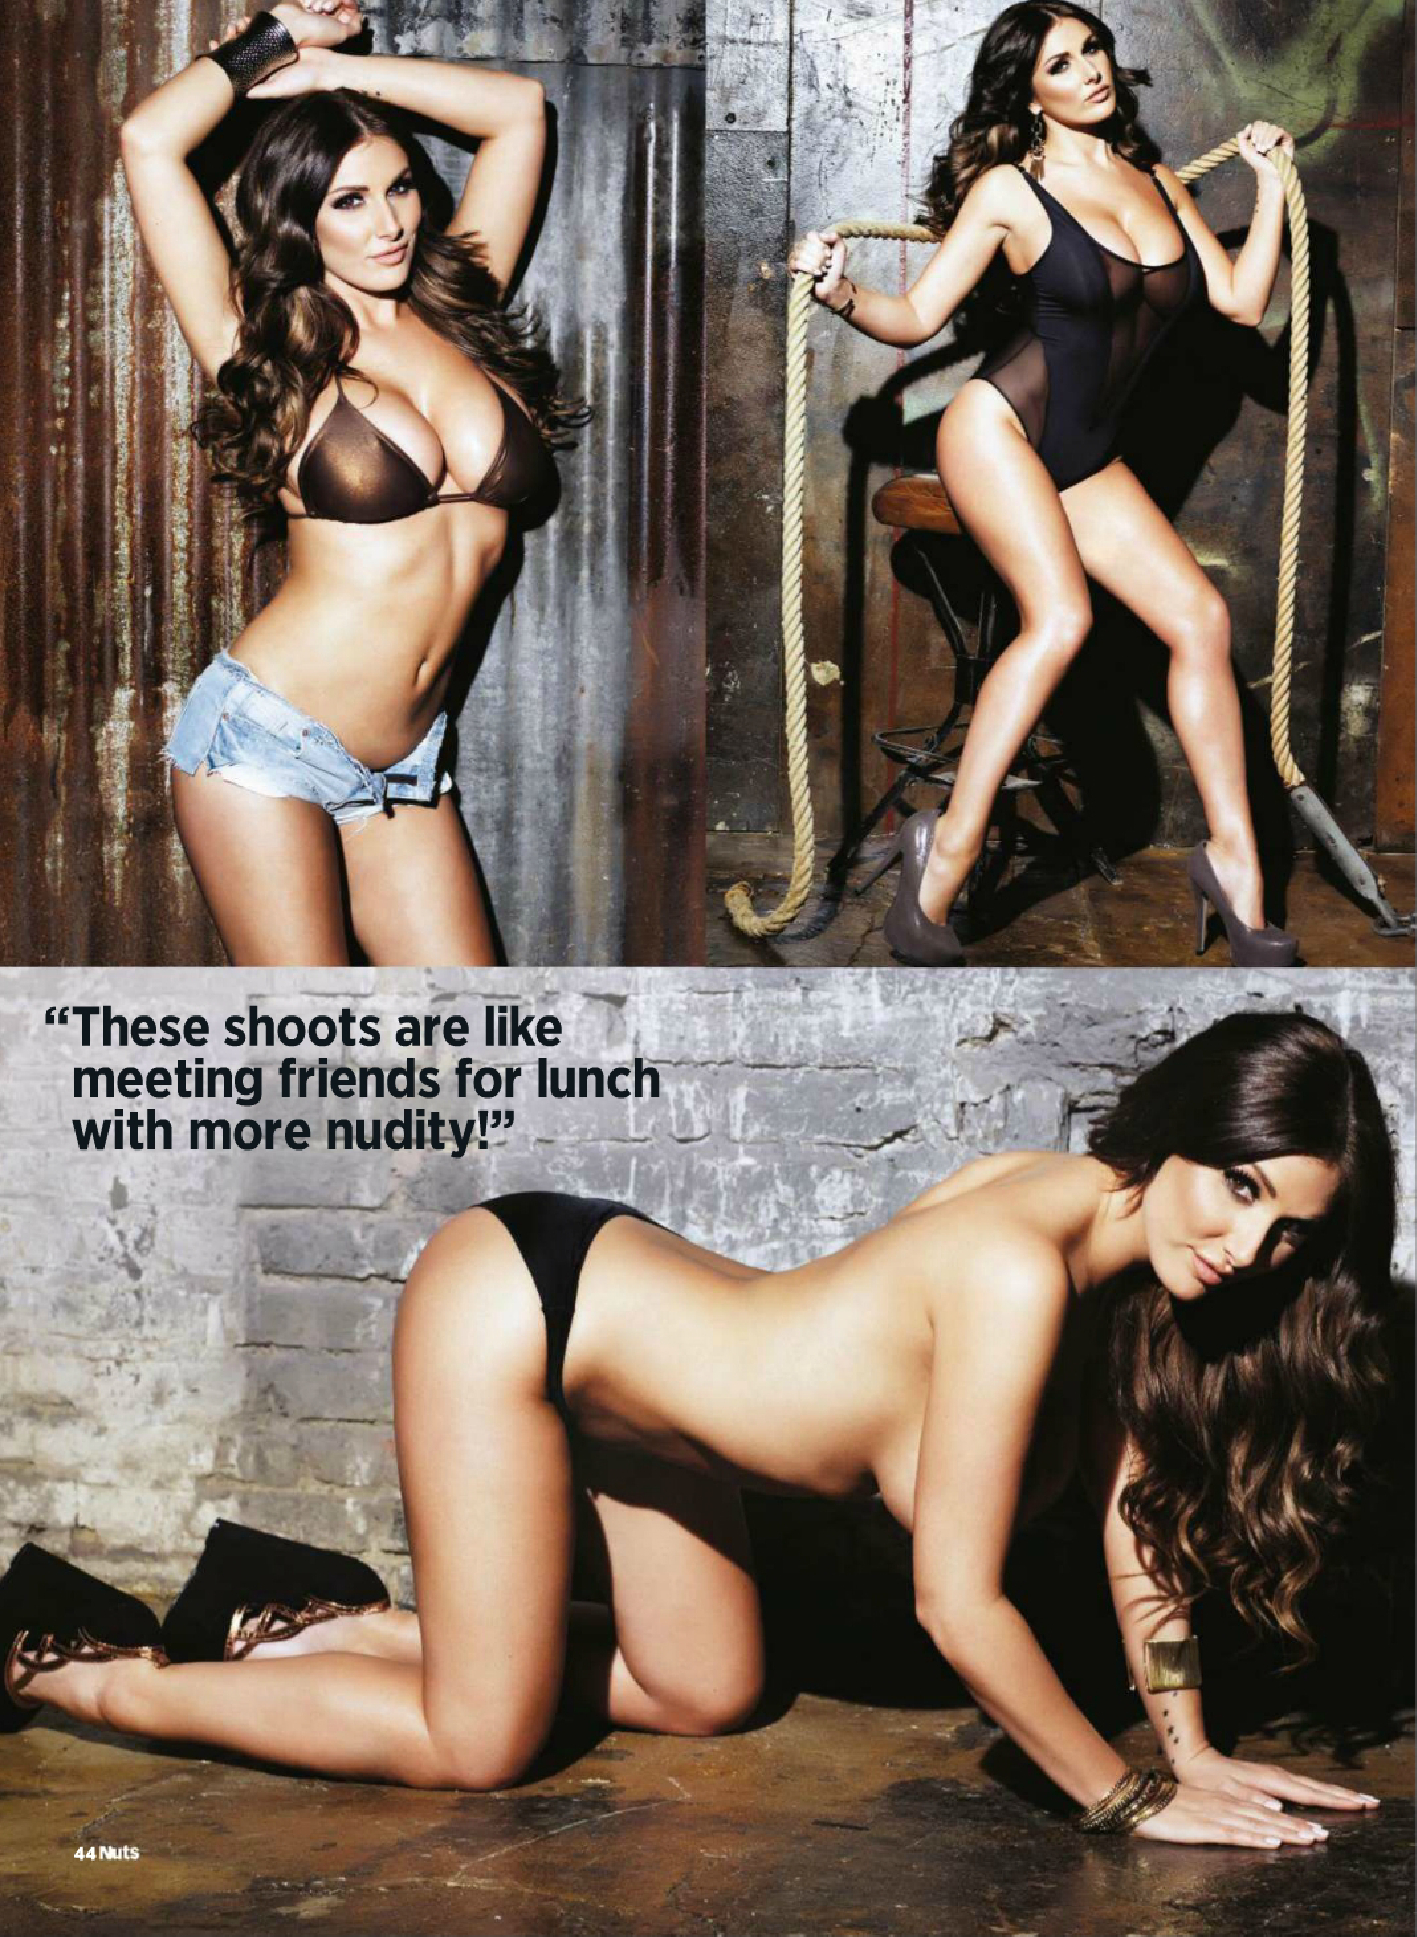 Lucy Pinder Magazine Nuts nue Novembre 2013 05